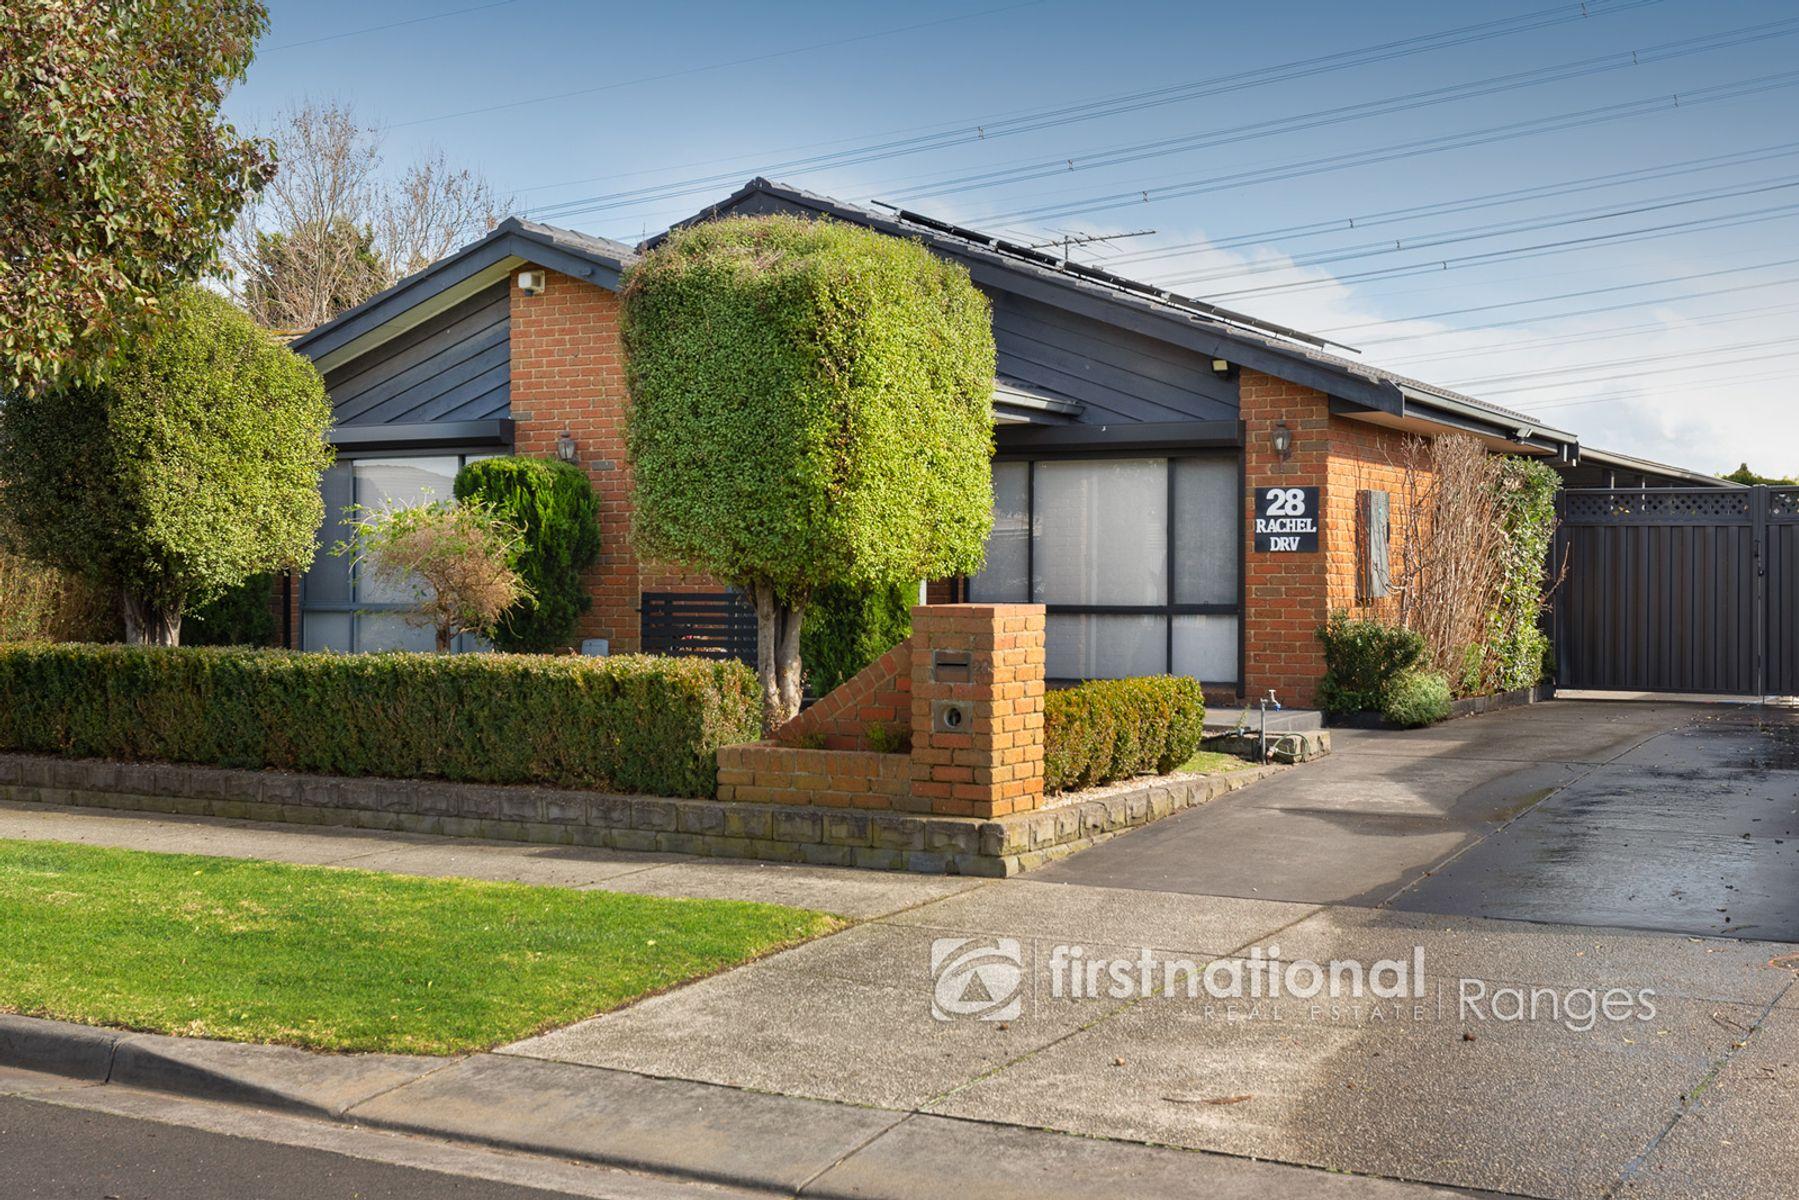 28 Rachel Drive, Cranbourne North, VIC 3977